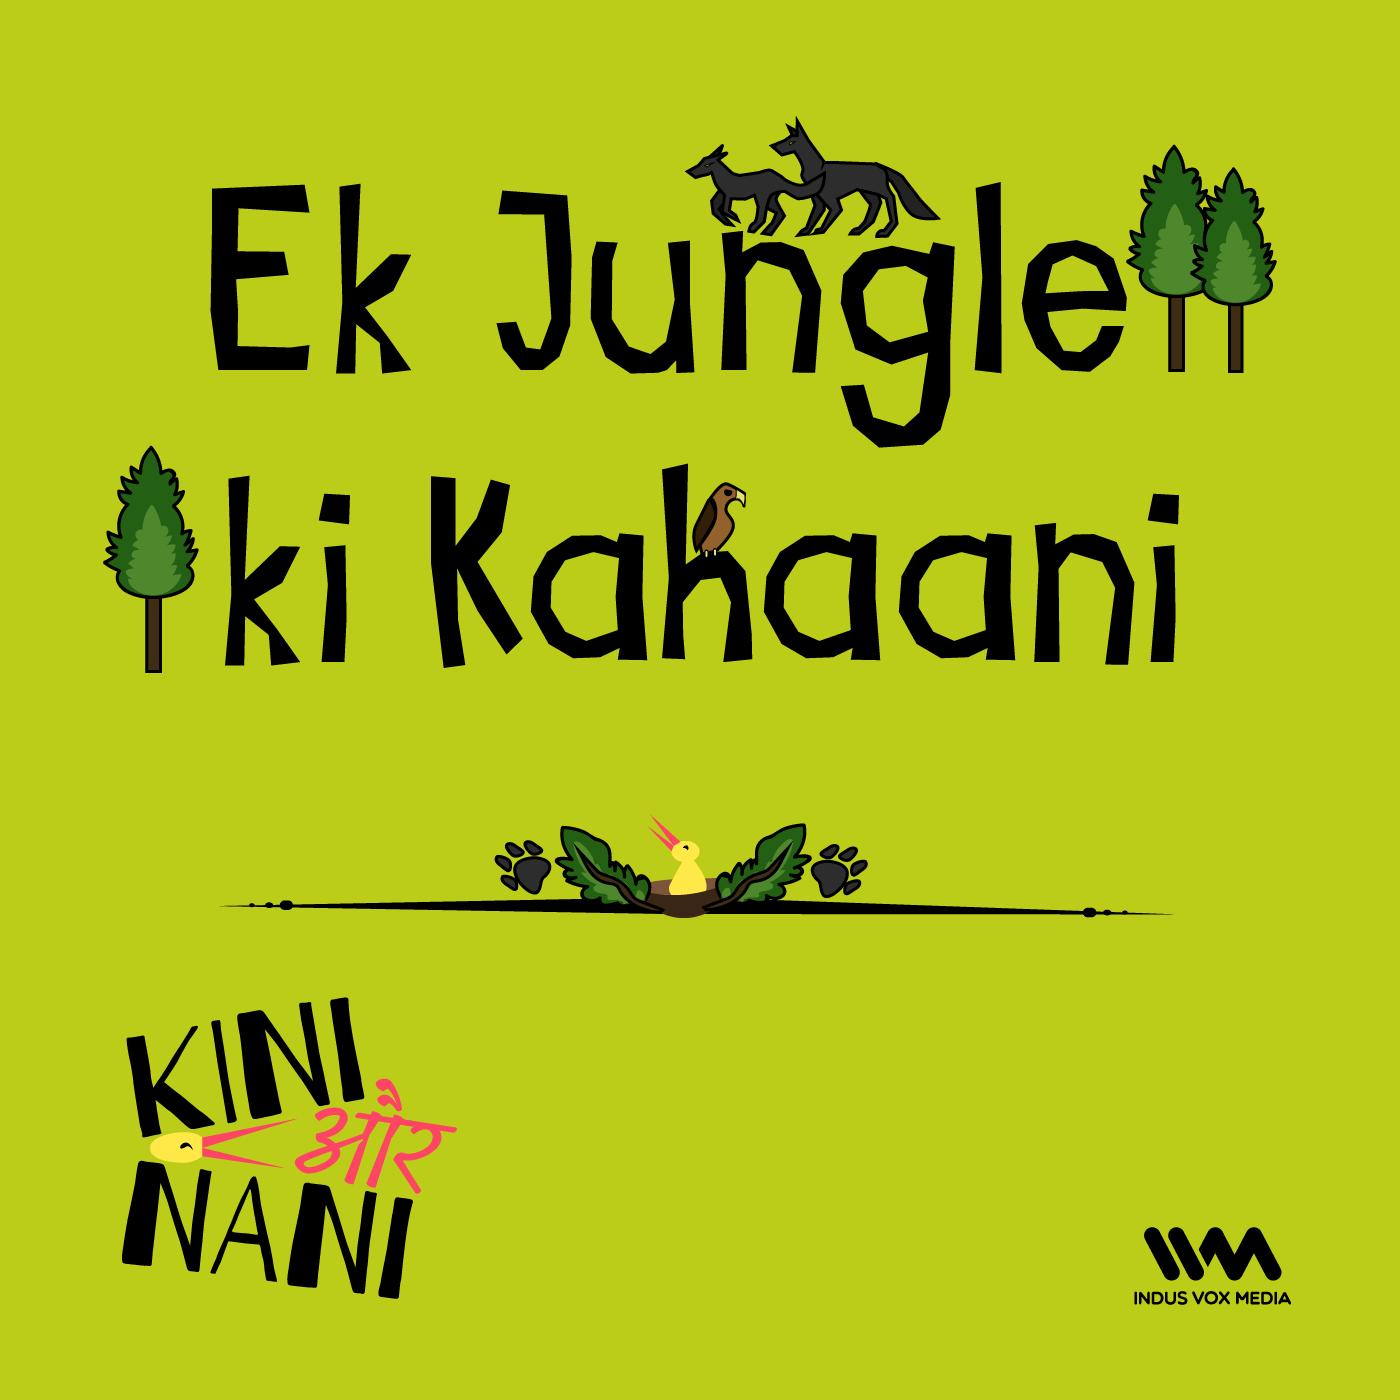 Ek Jungle ki Kahaani